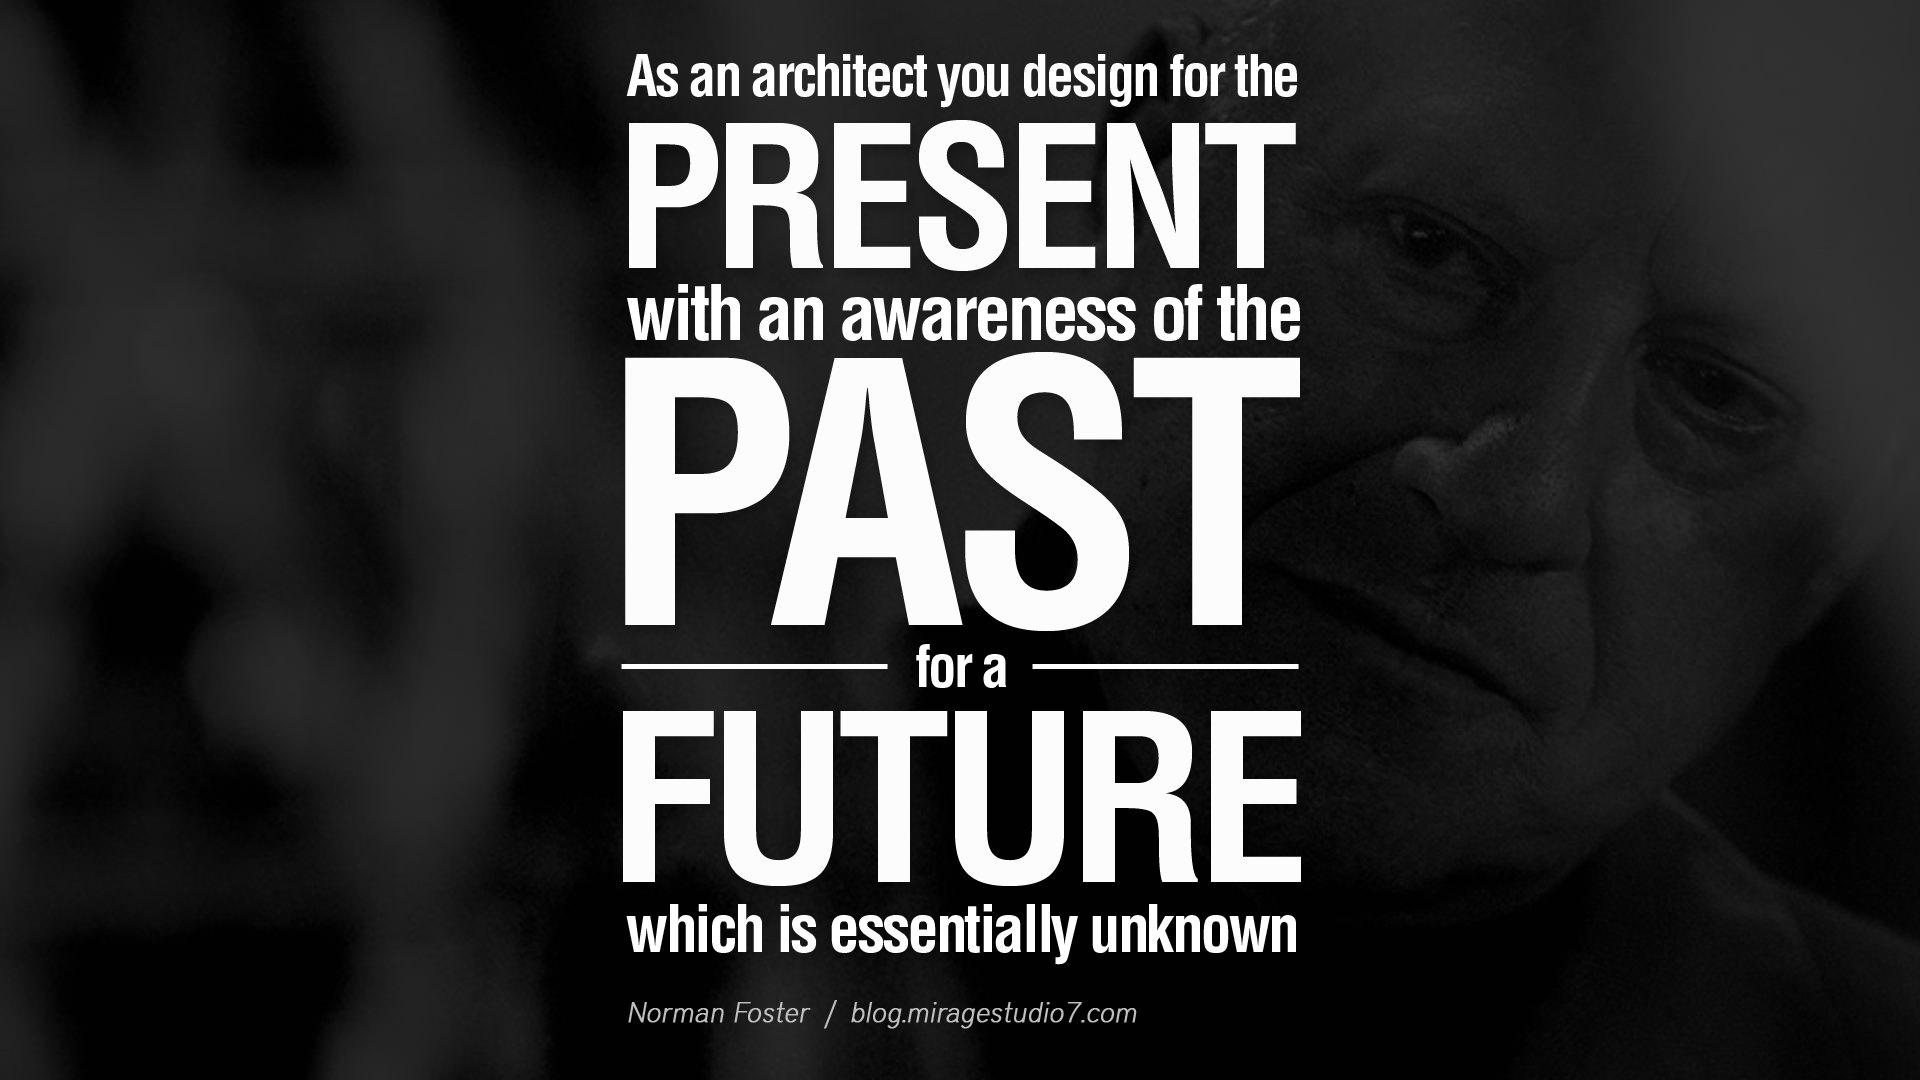 quotes architecture zaha hadid architect famous quotesgram